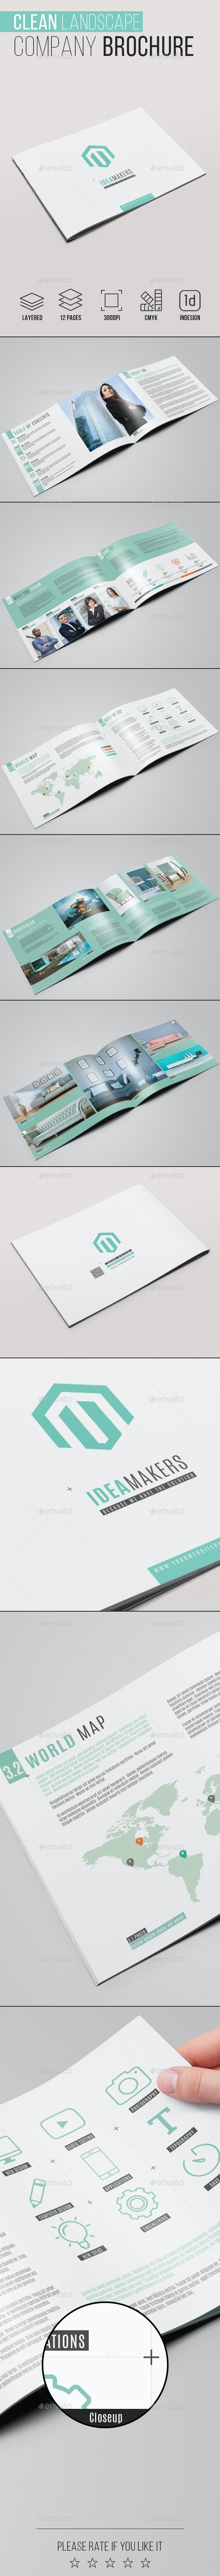 Clean Landscape Company Brochure - Corporate Brochures